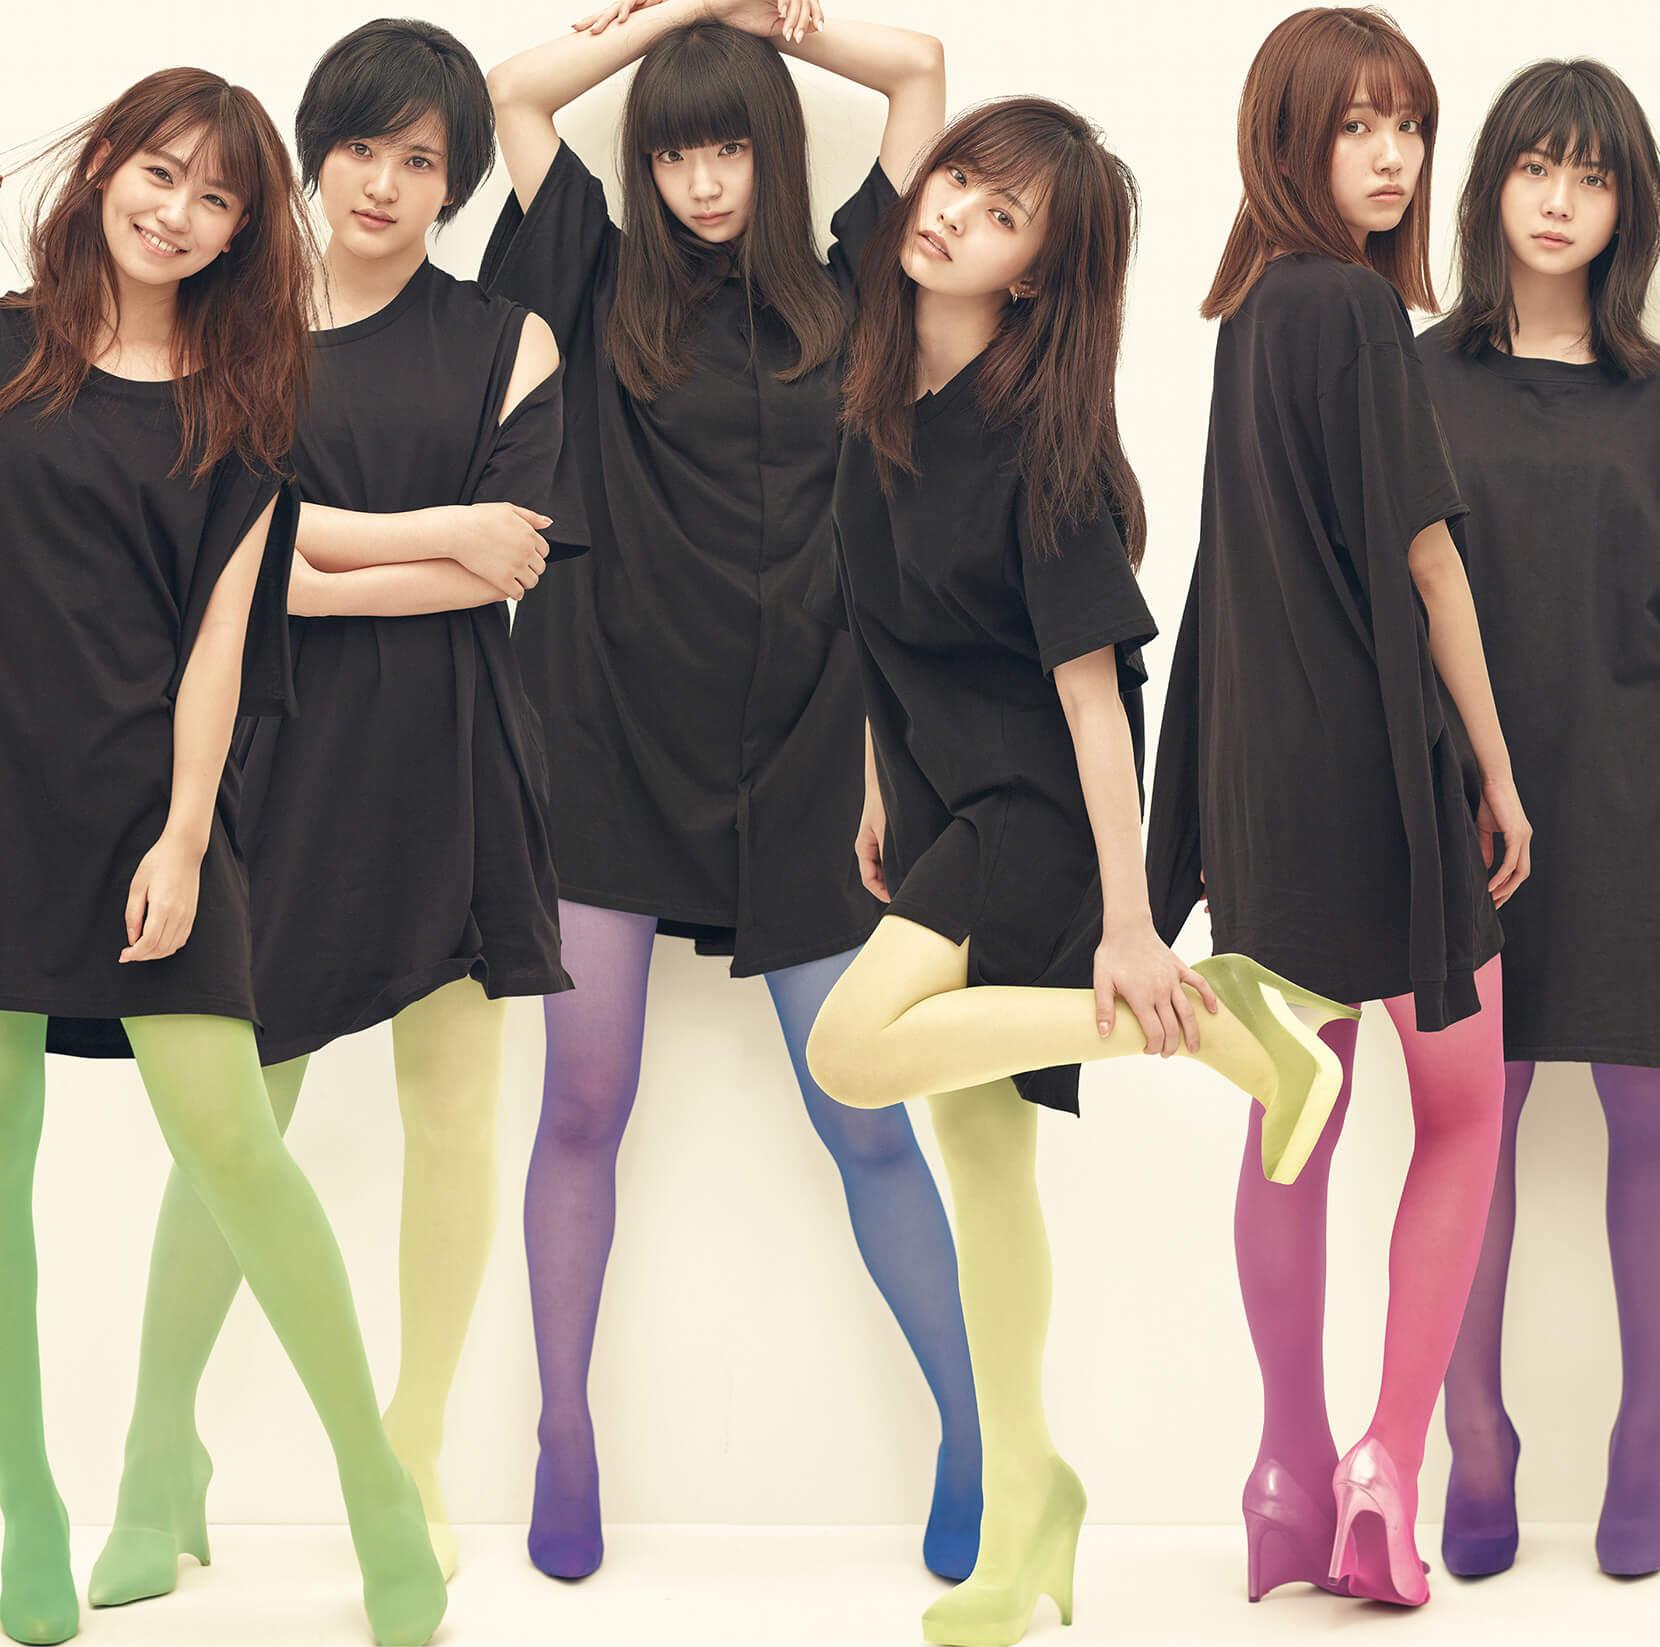 50th Single「11月のアンクレット」 Type C【初回限定盤】